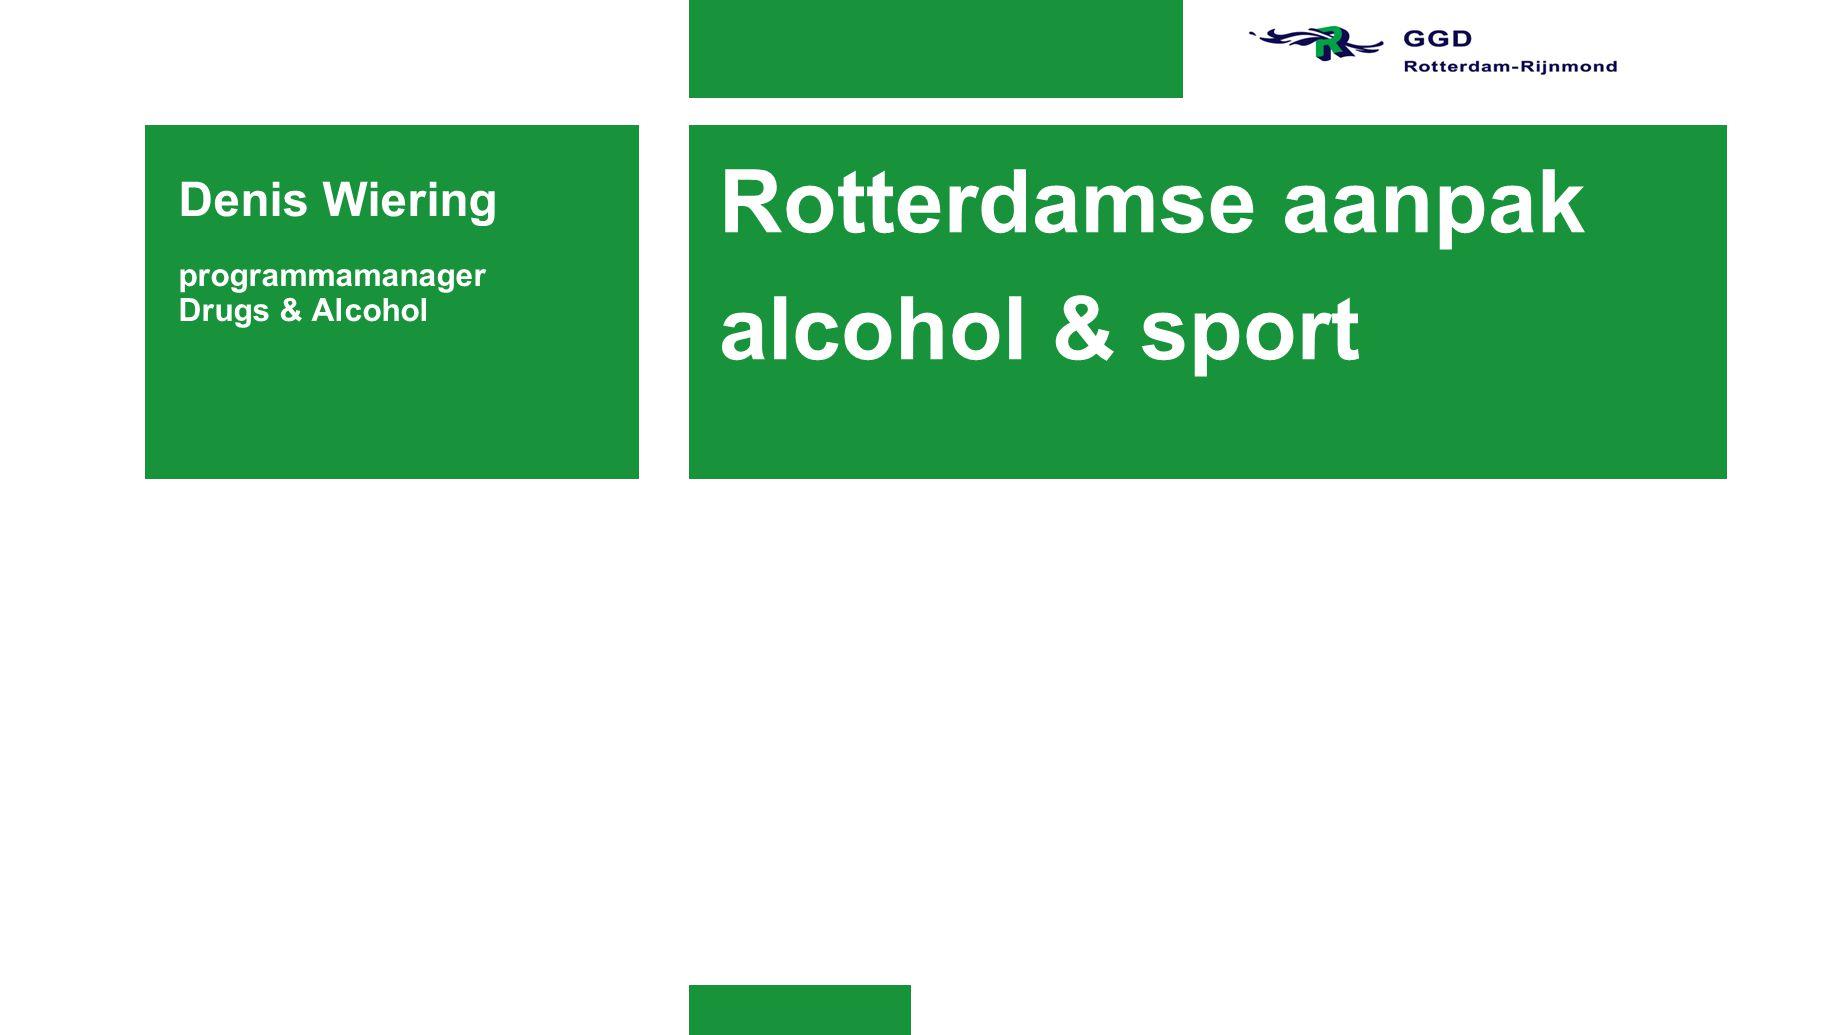 Rotterdamse aanpak alcohol & sport